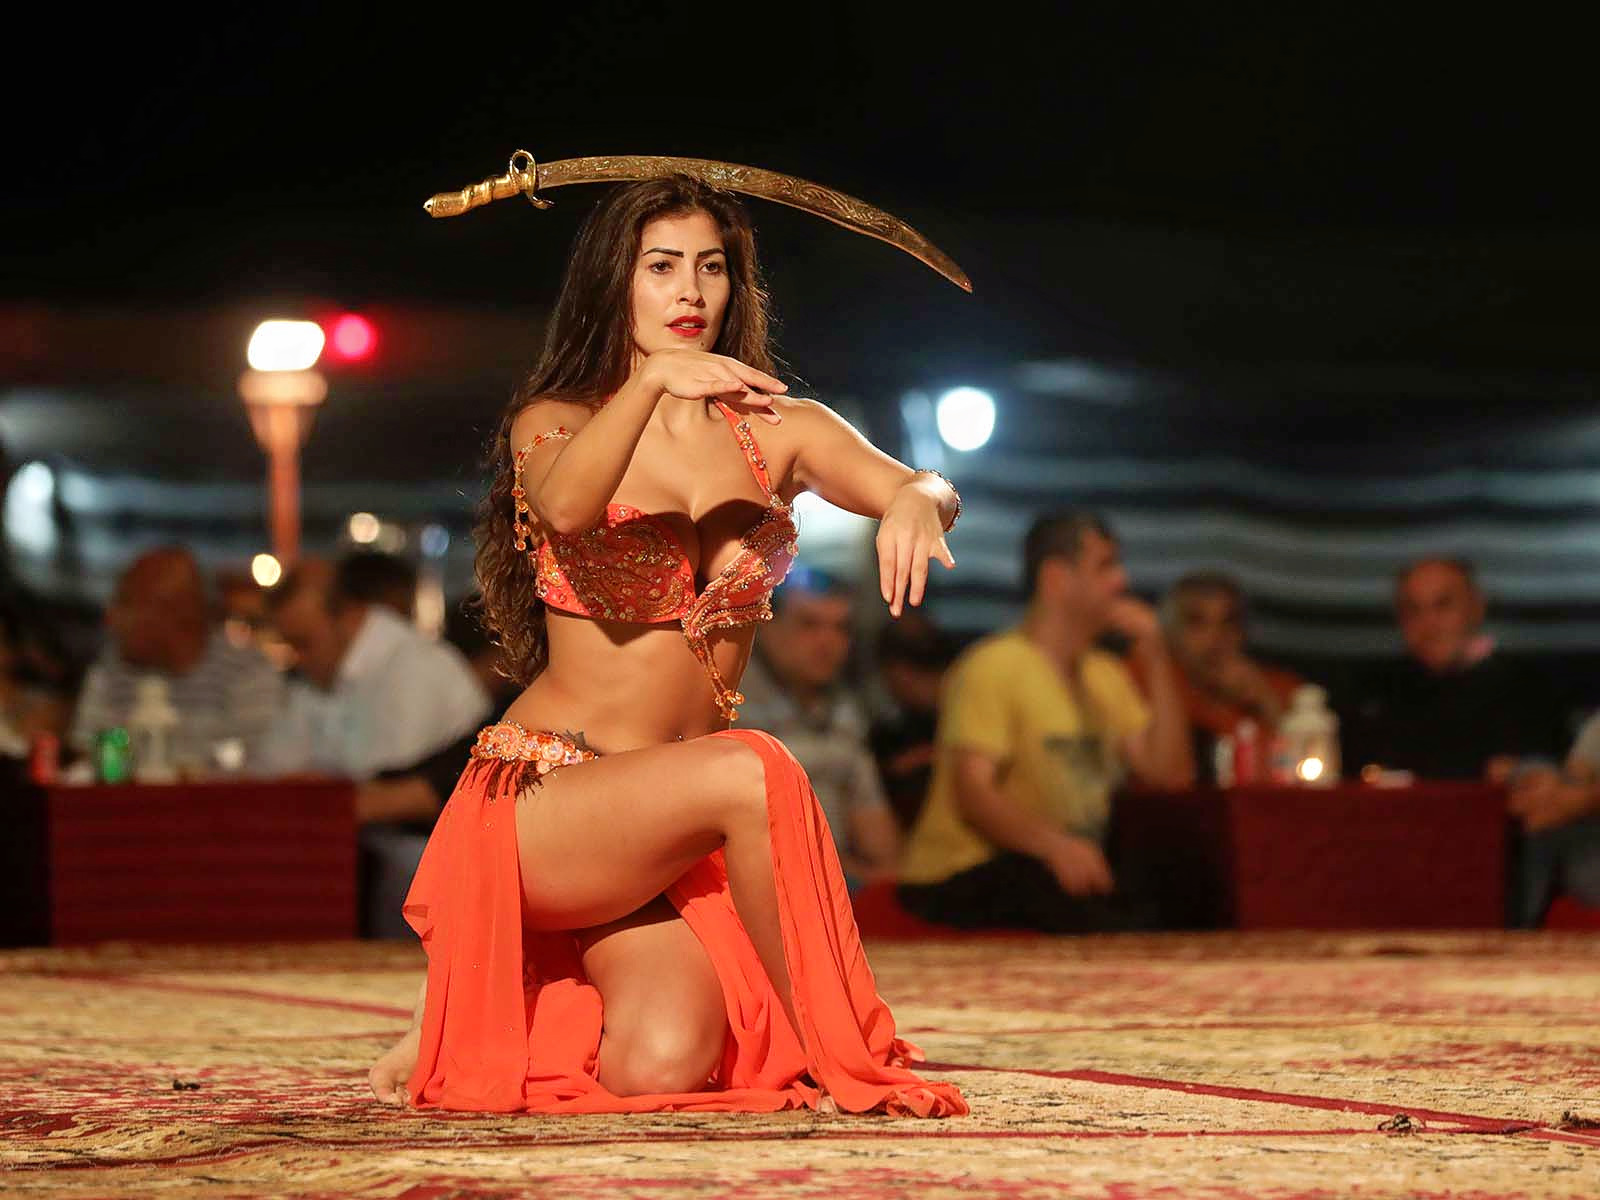 1511331440_belly-dance-in-dubai-desert.jpg